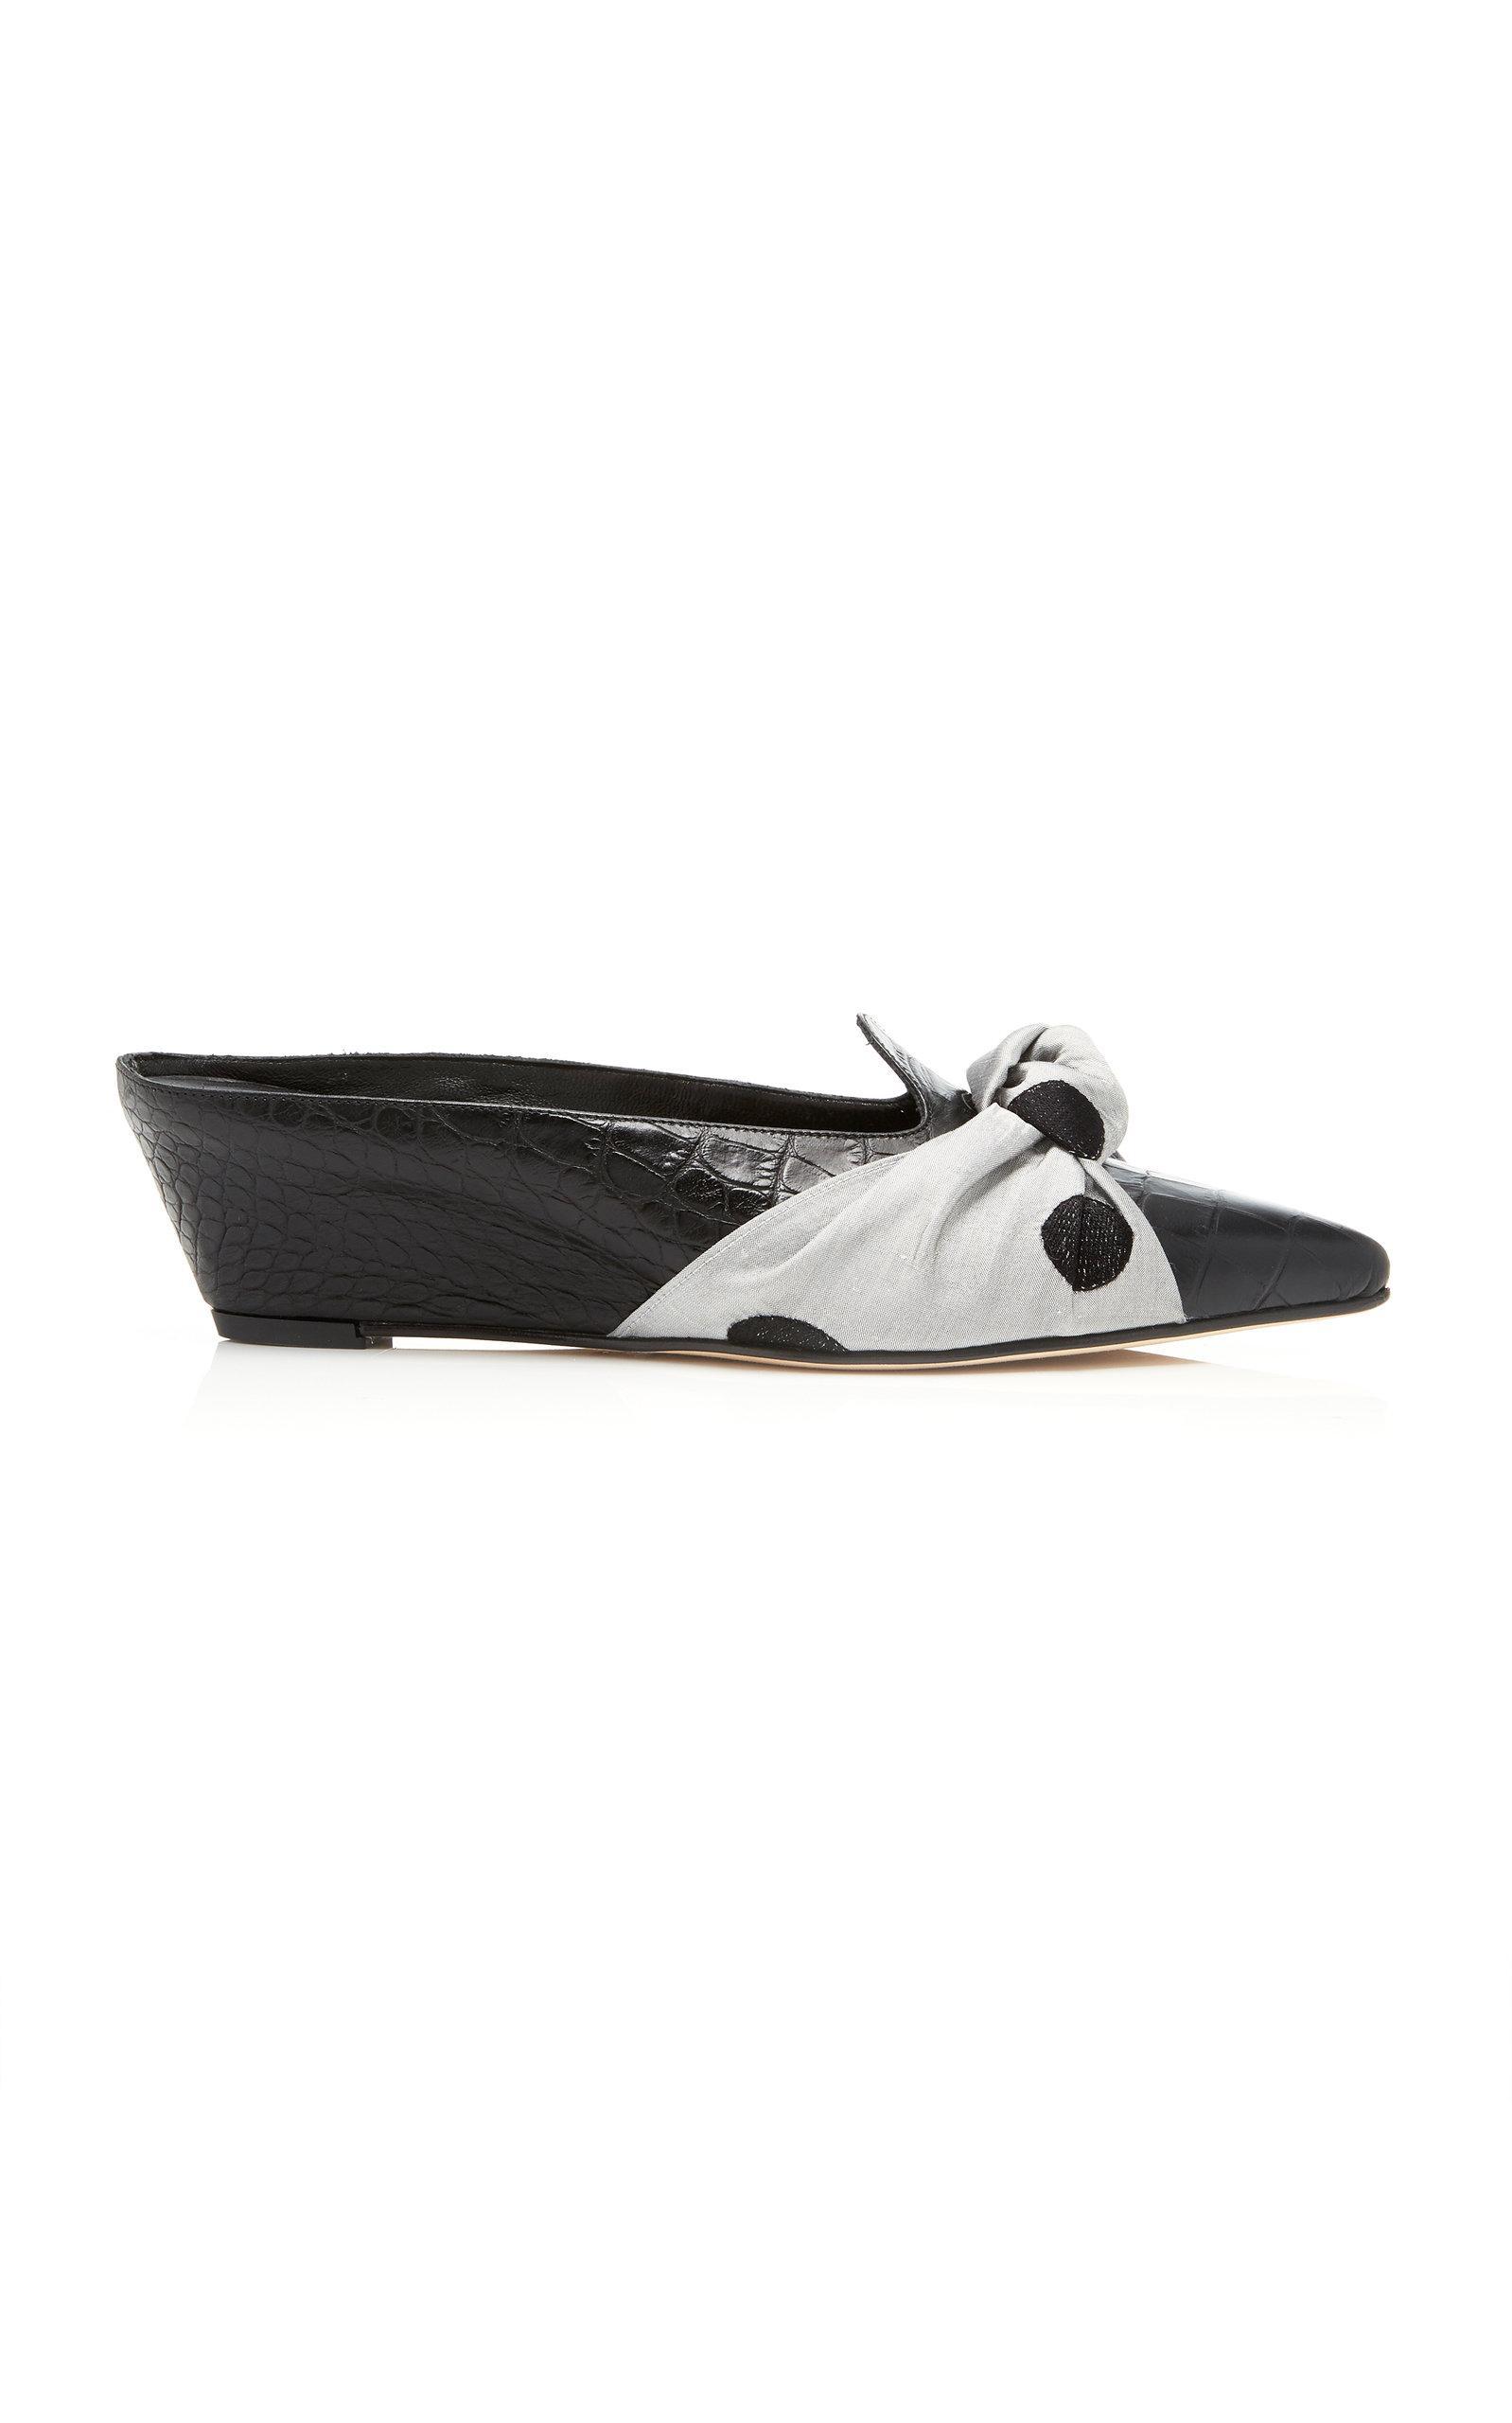 Trademark Adrien Knot Slide In Black